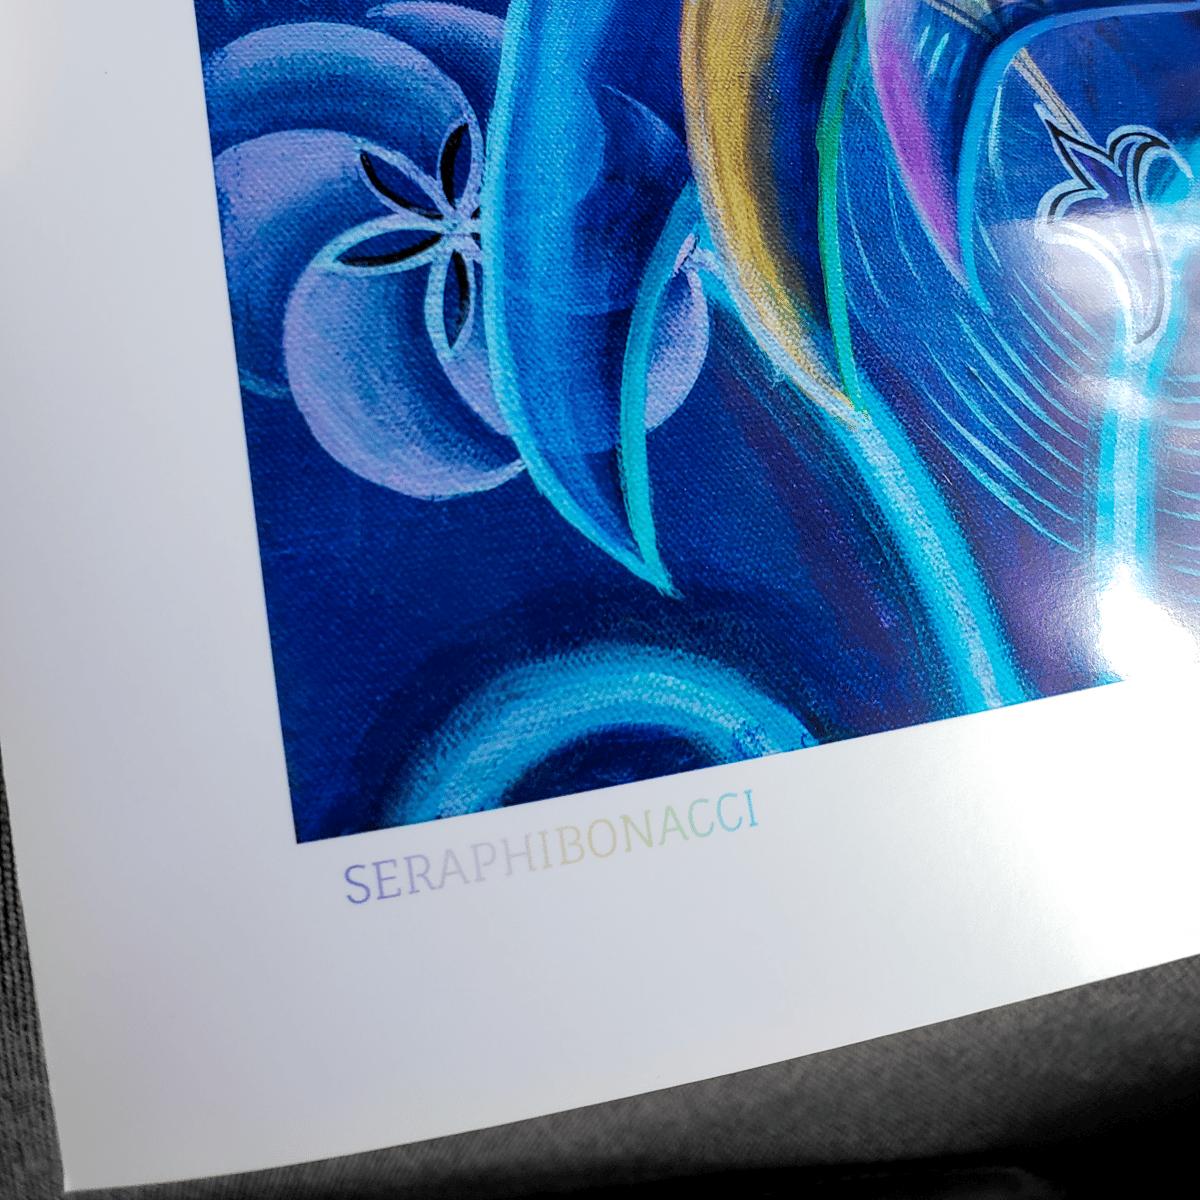 Image of 'Seraphibonacci' limited edition poster